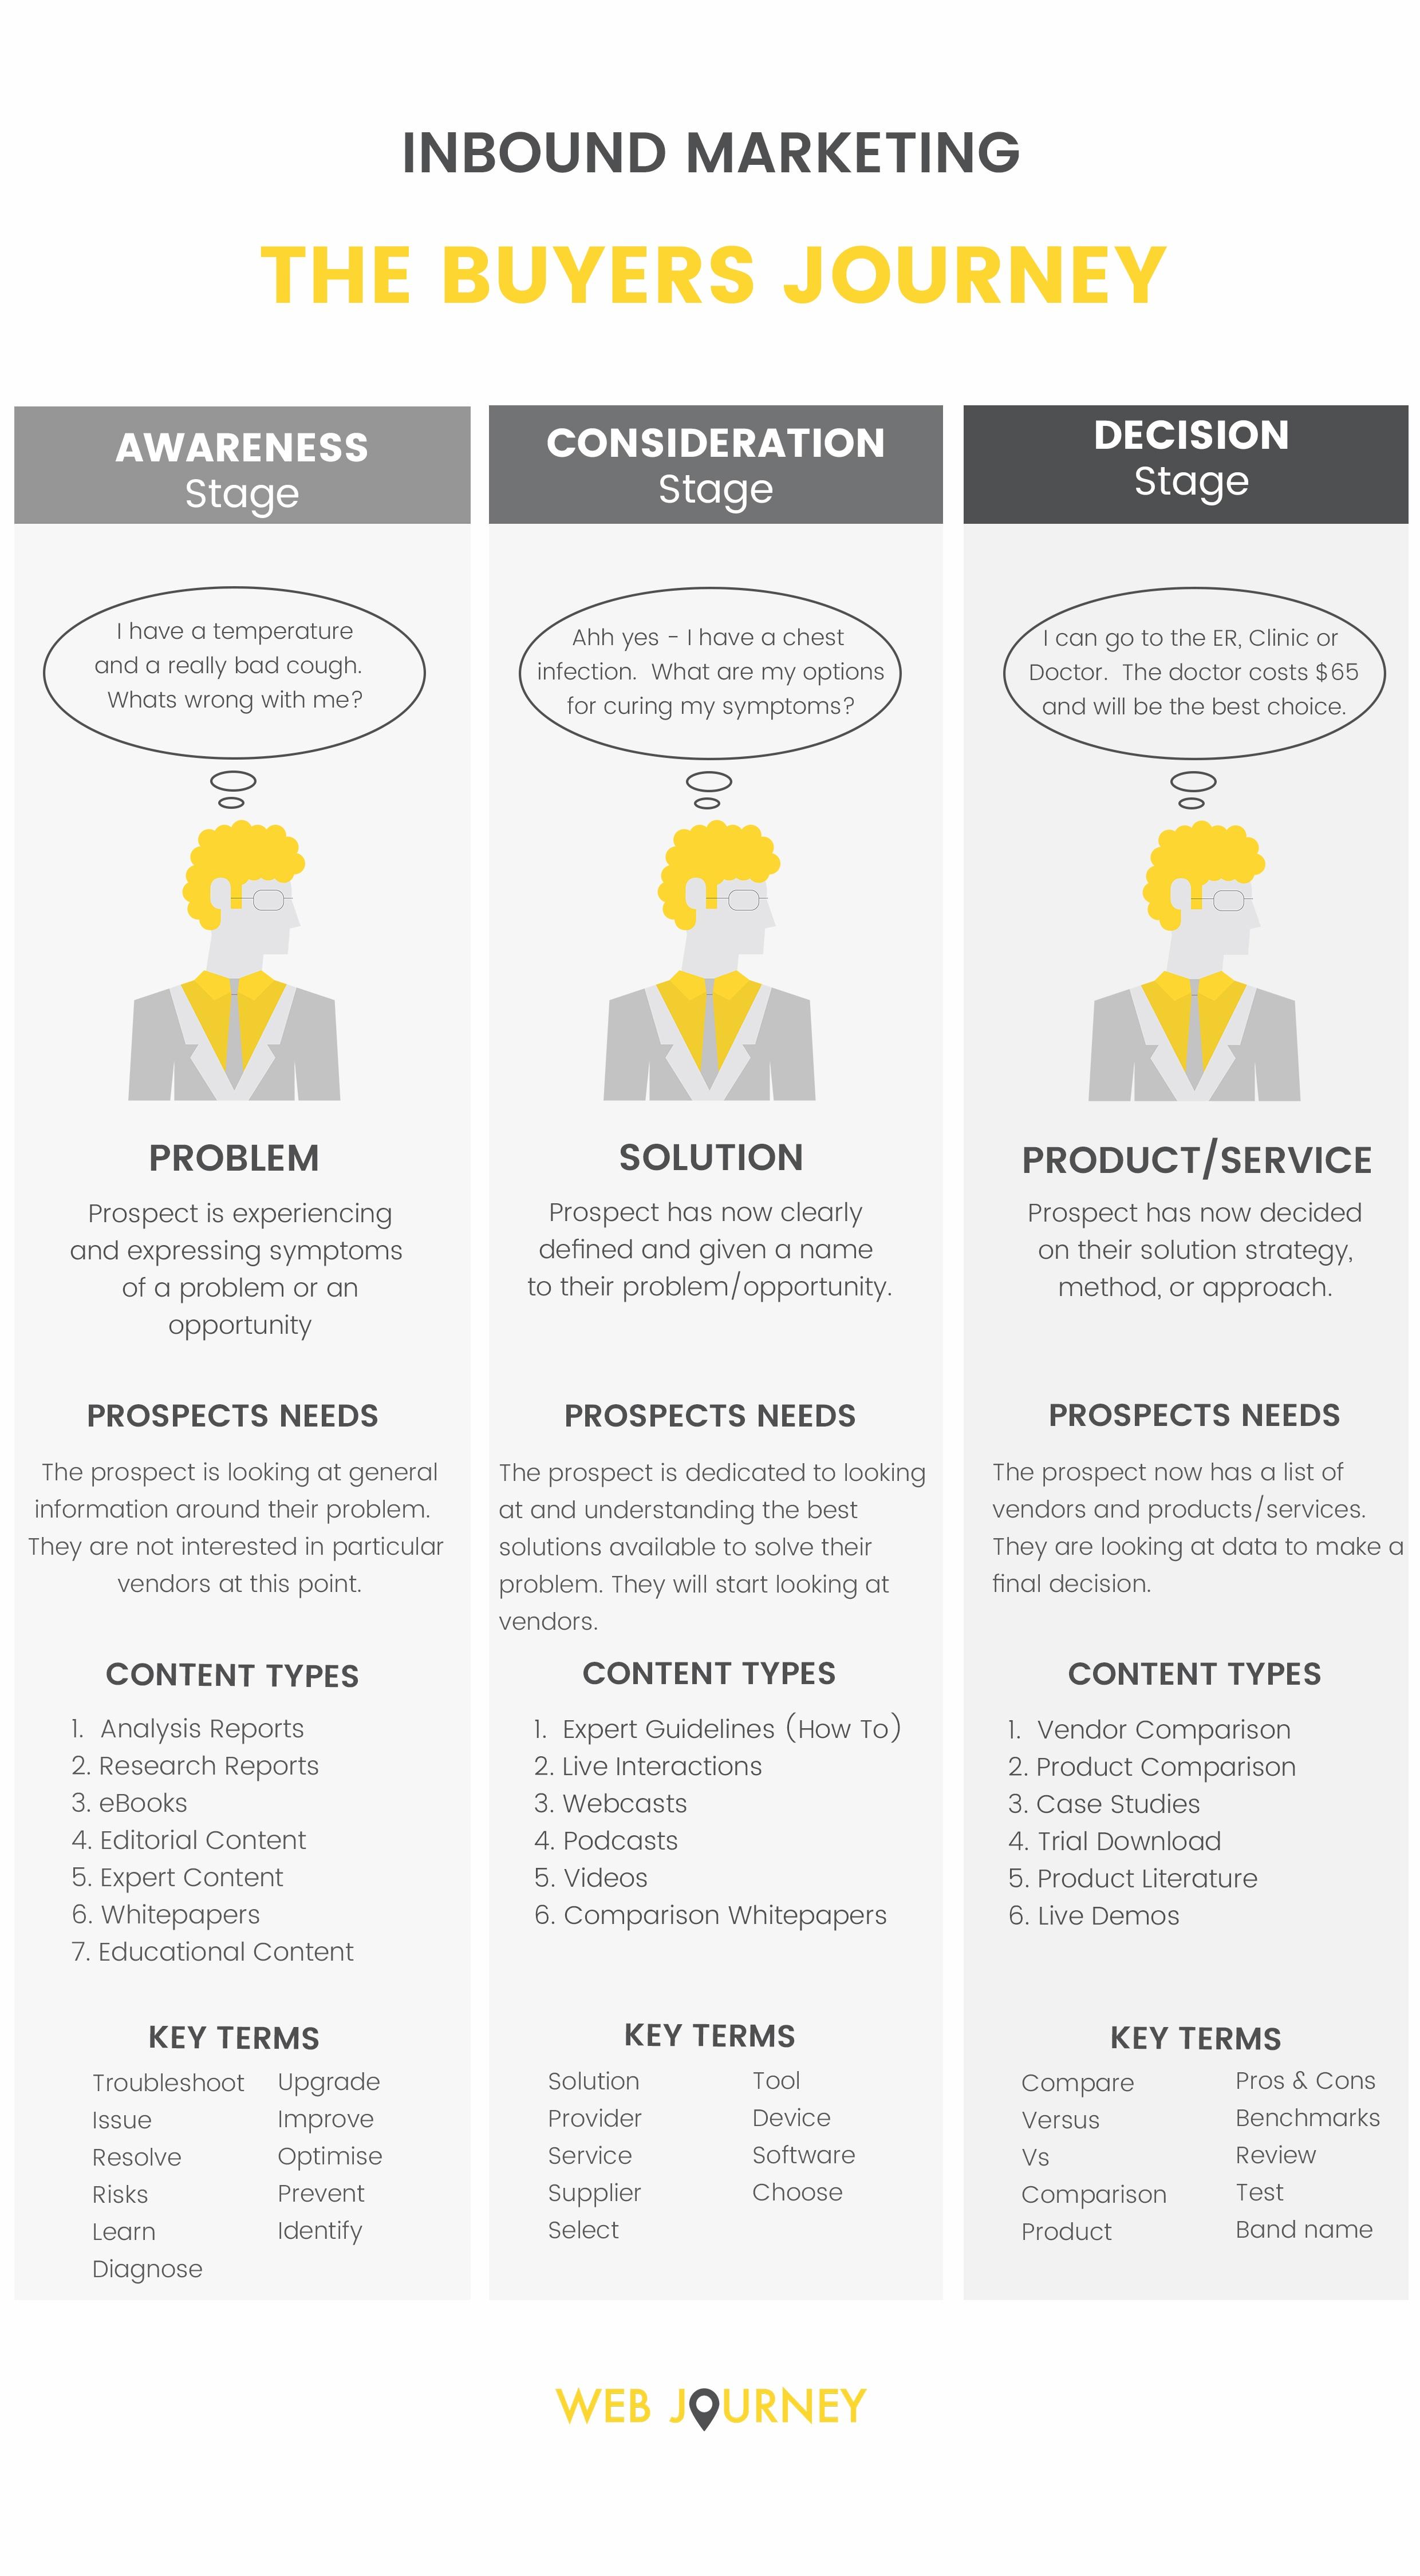 Inbound-Marketing-Buyers-Journey-Infographic---Web-Journey-Oct-2017.jpg